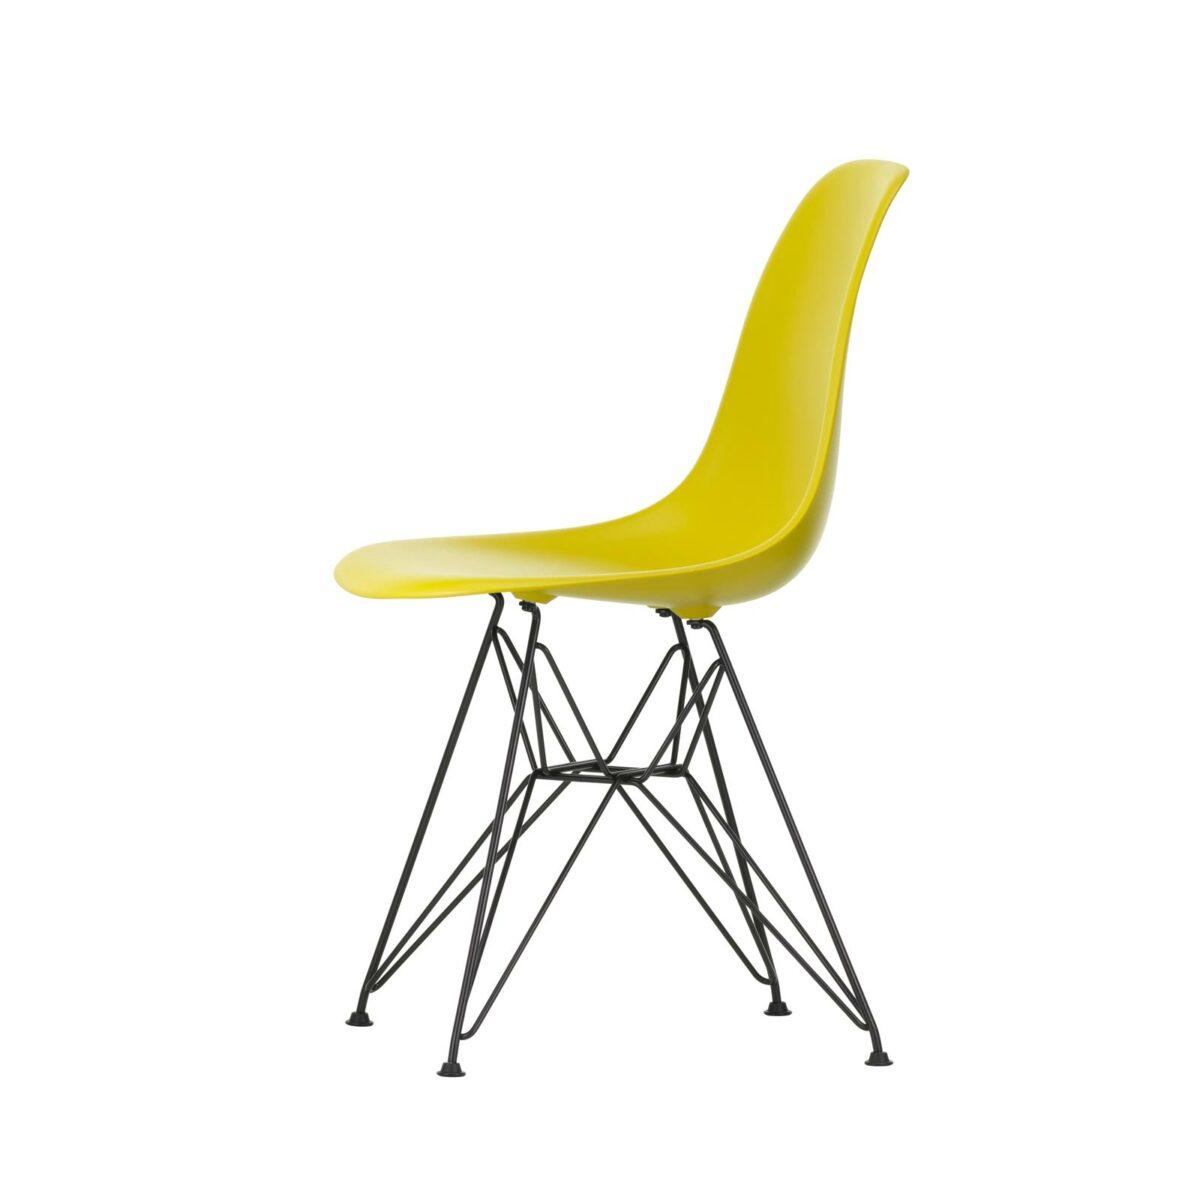 2779115 Eames Plastic Side Chair DSR 34 mustard 30 basic dark powder coated left master